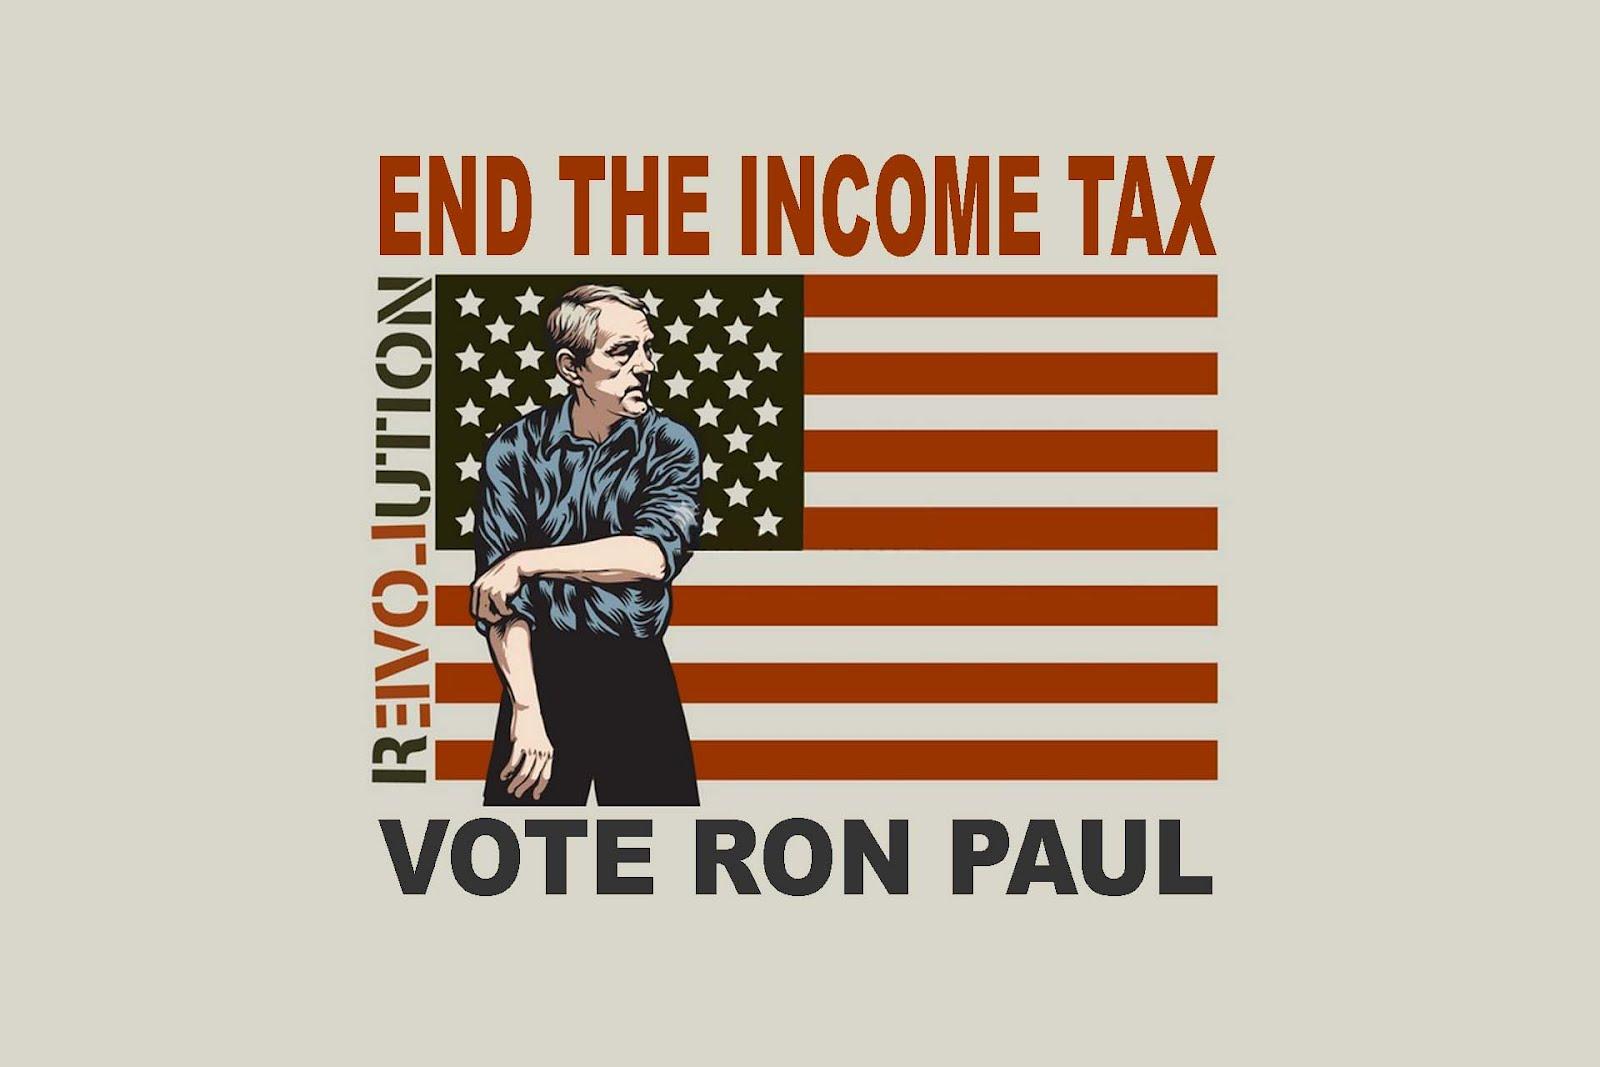 http://3.bp.blogspot.com/-yenbUOE1_OQ/T1LKPc2dE5I/AAAAAAAAB48/pbMG4xQoecw/s1600/ron-paul-flag-revolution-end-income-tax-wallpaper.jpg